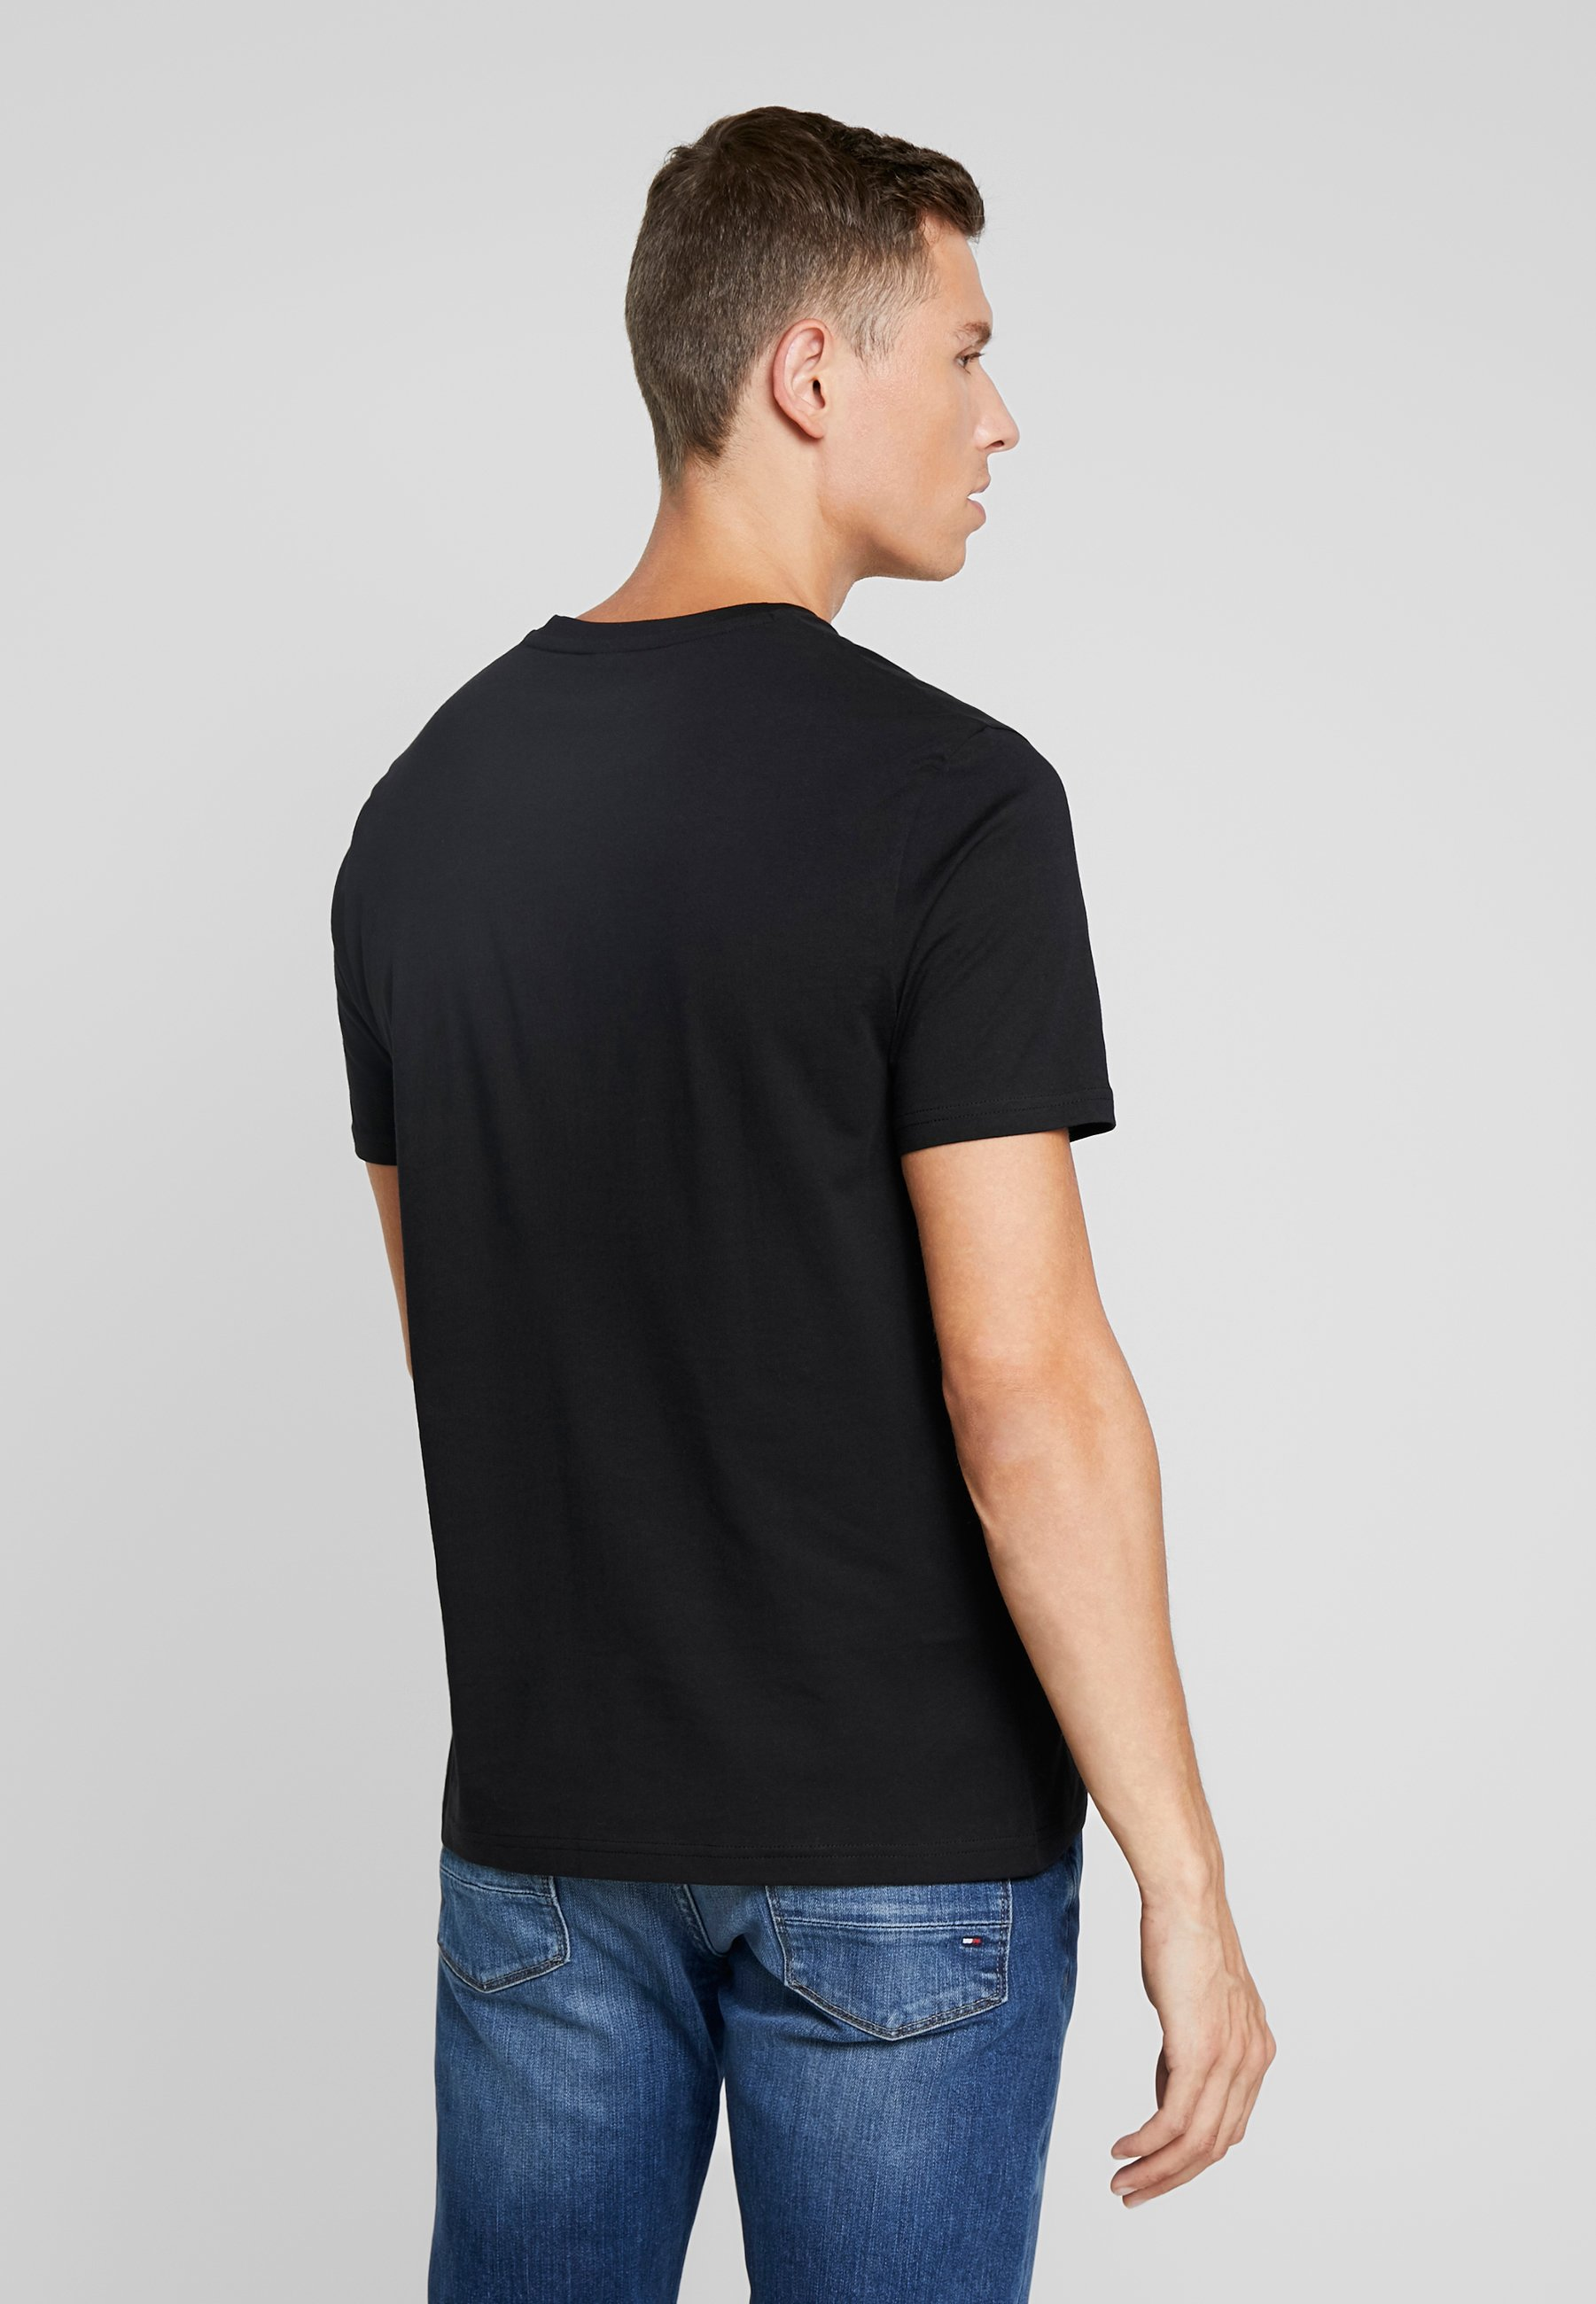 Ben TeeT shirt Black Sherman Logo Basique QxBCtdhros